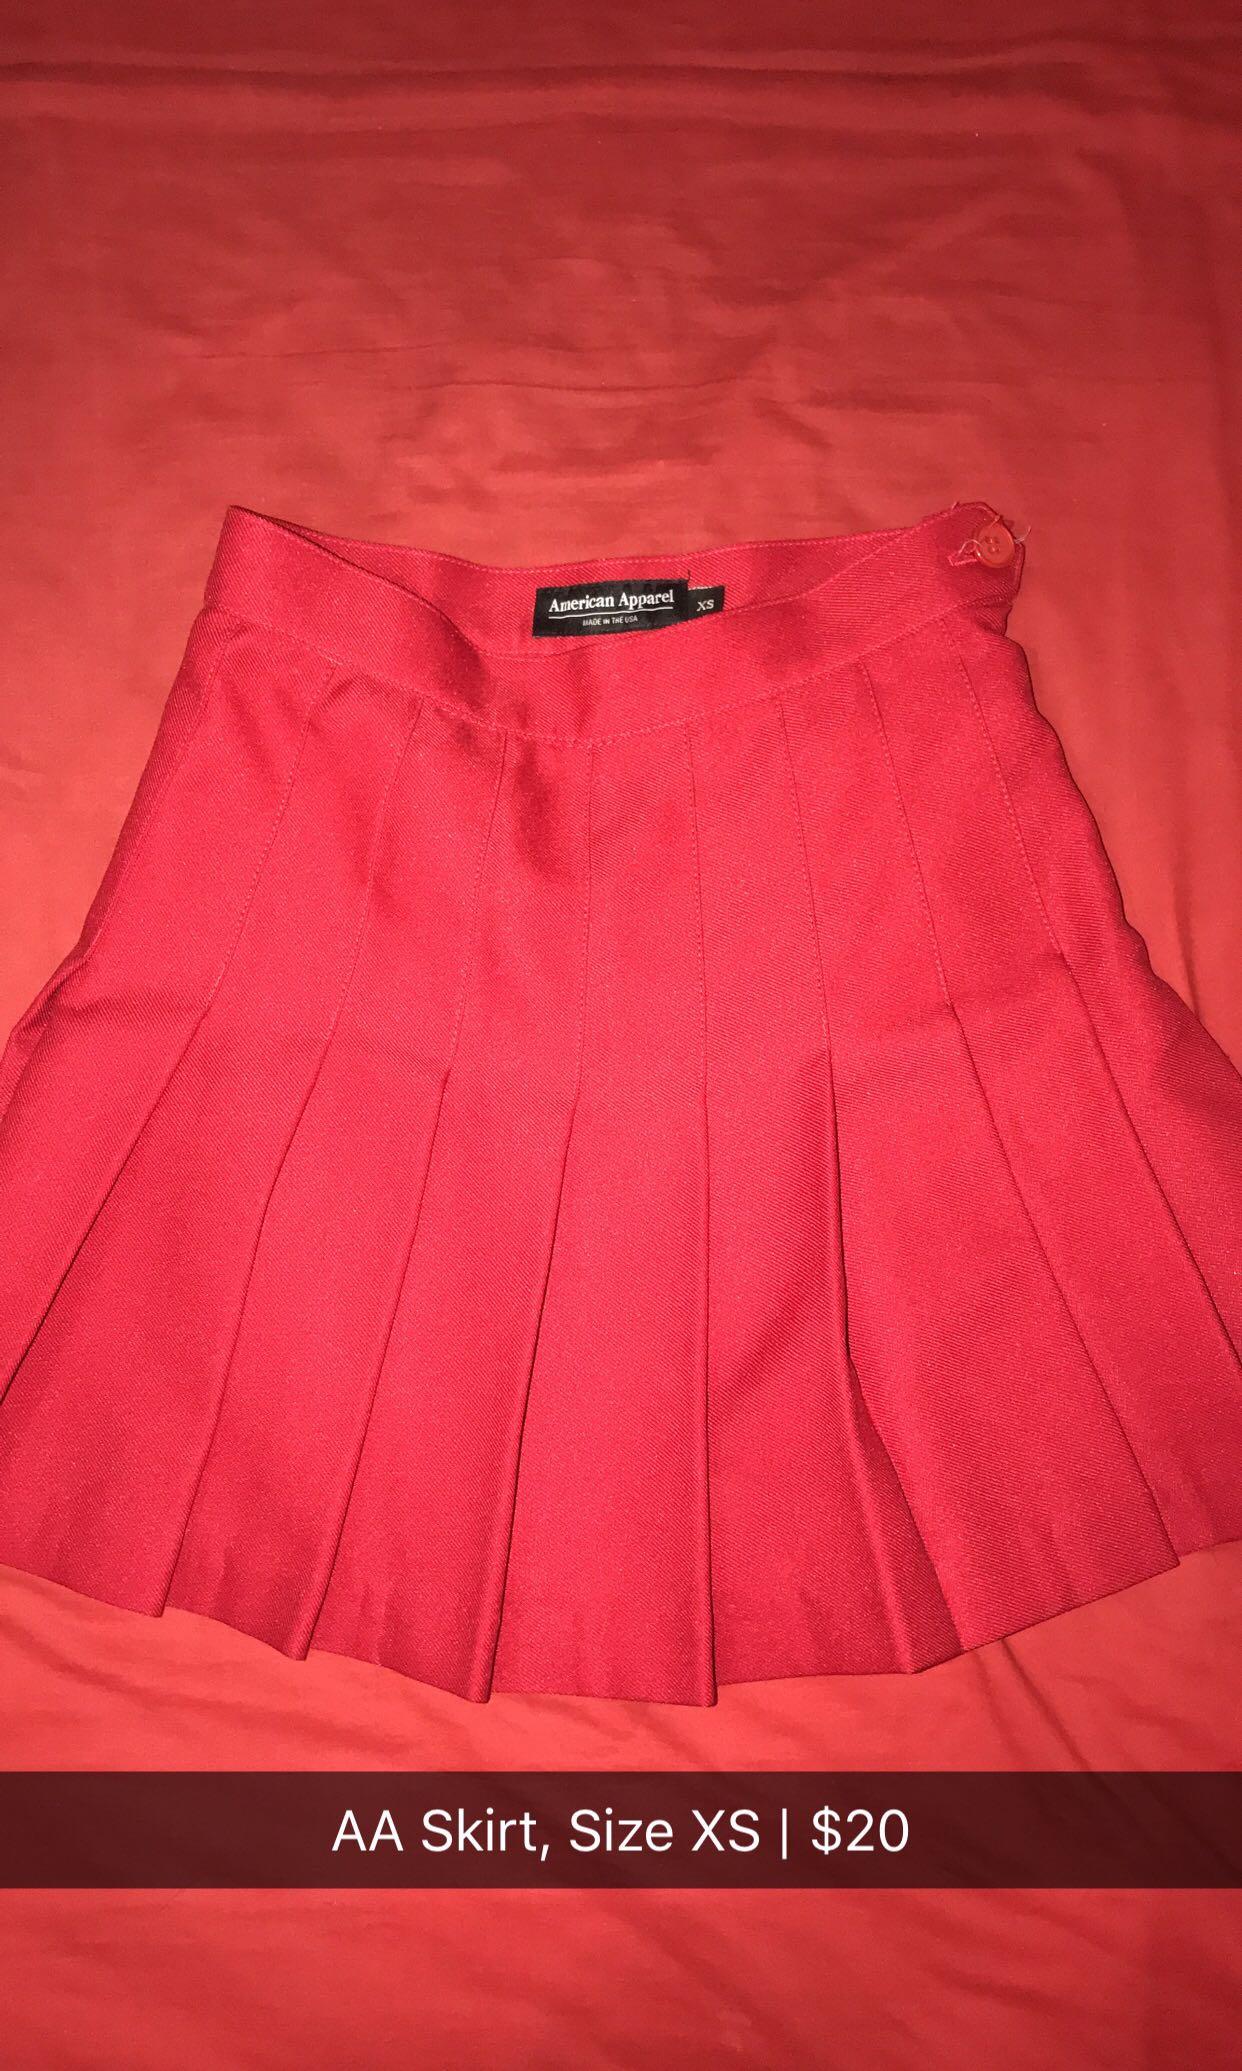 American Apparel Skirt - Red